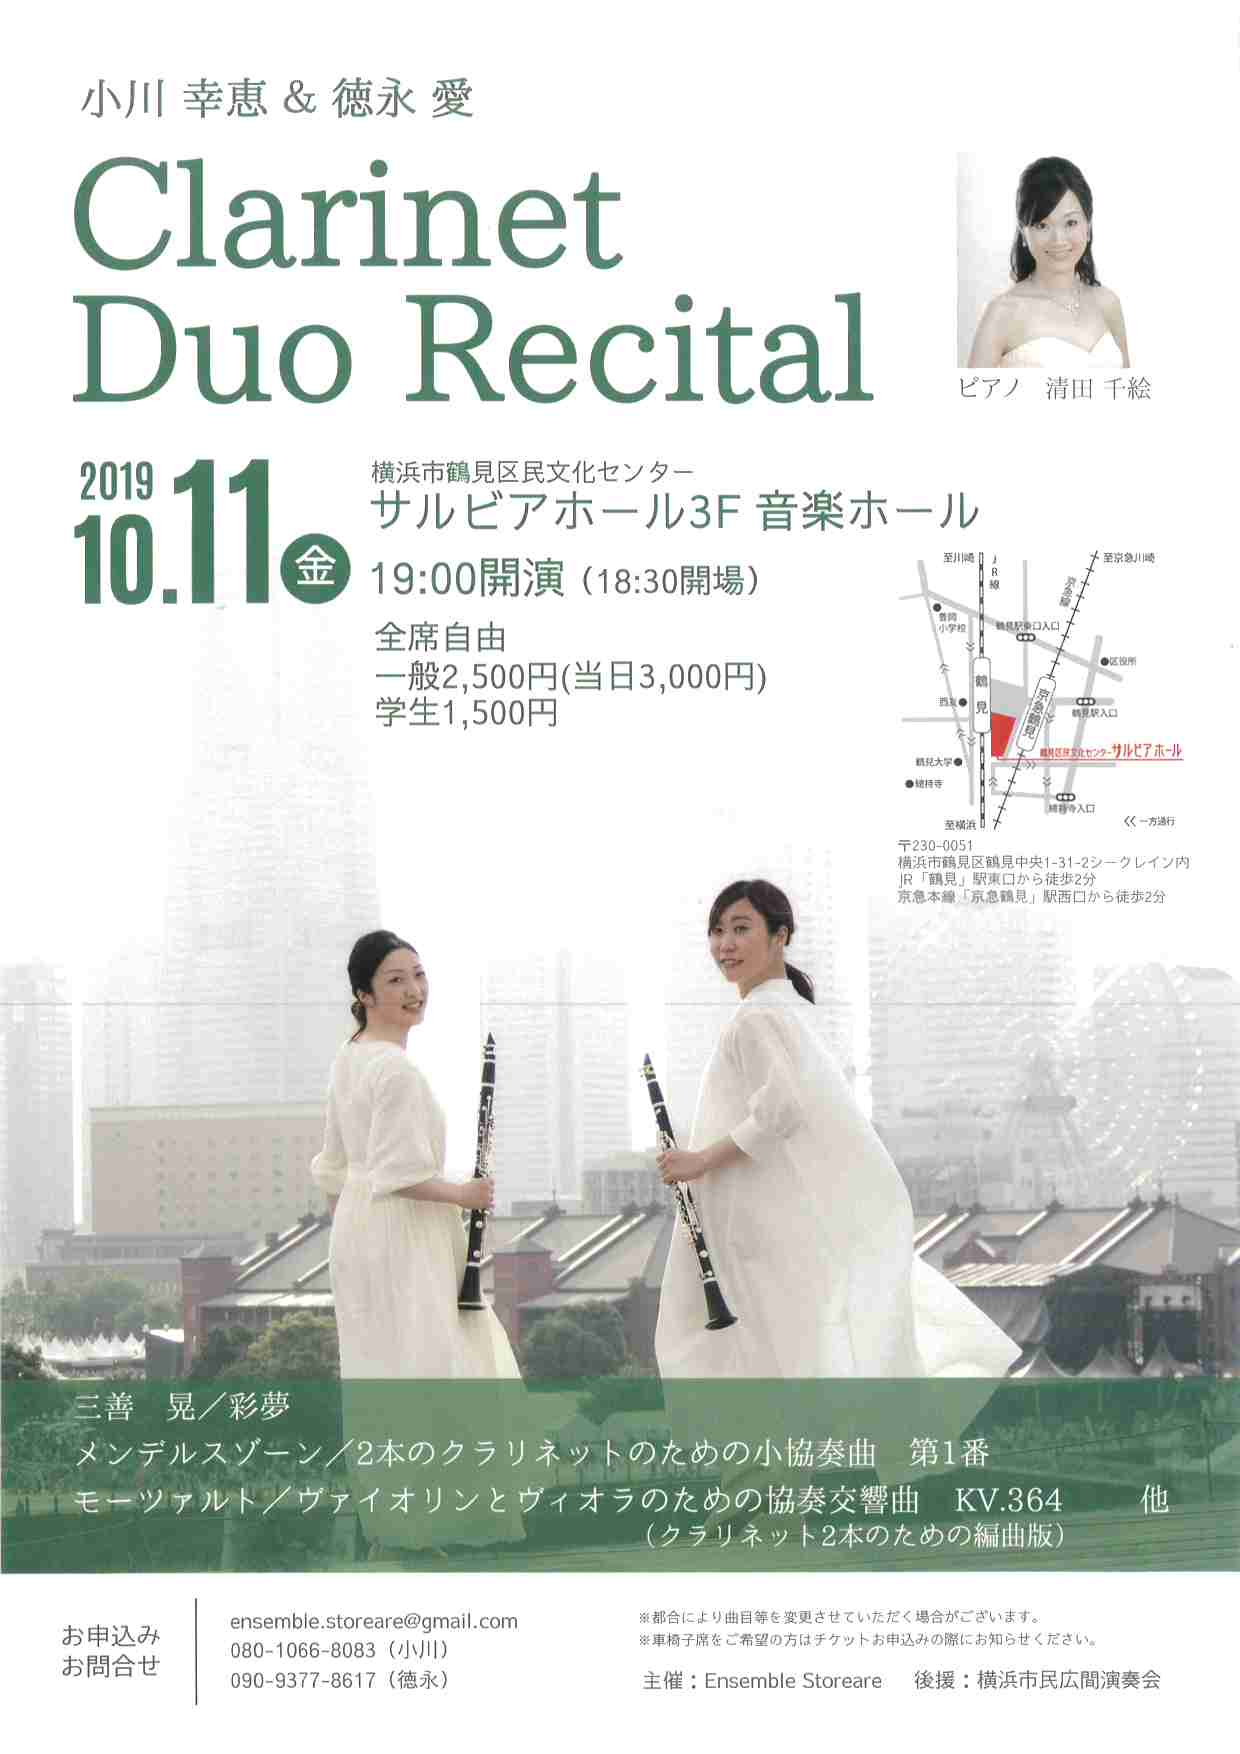 小川幸恵 & 徳永愛 Clarinet Duo Recital